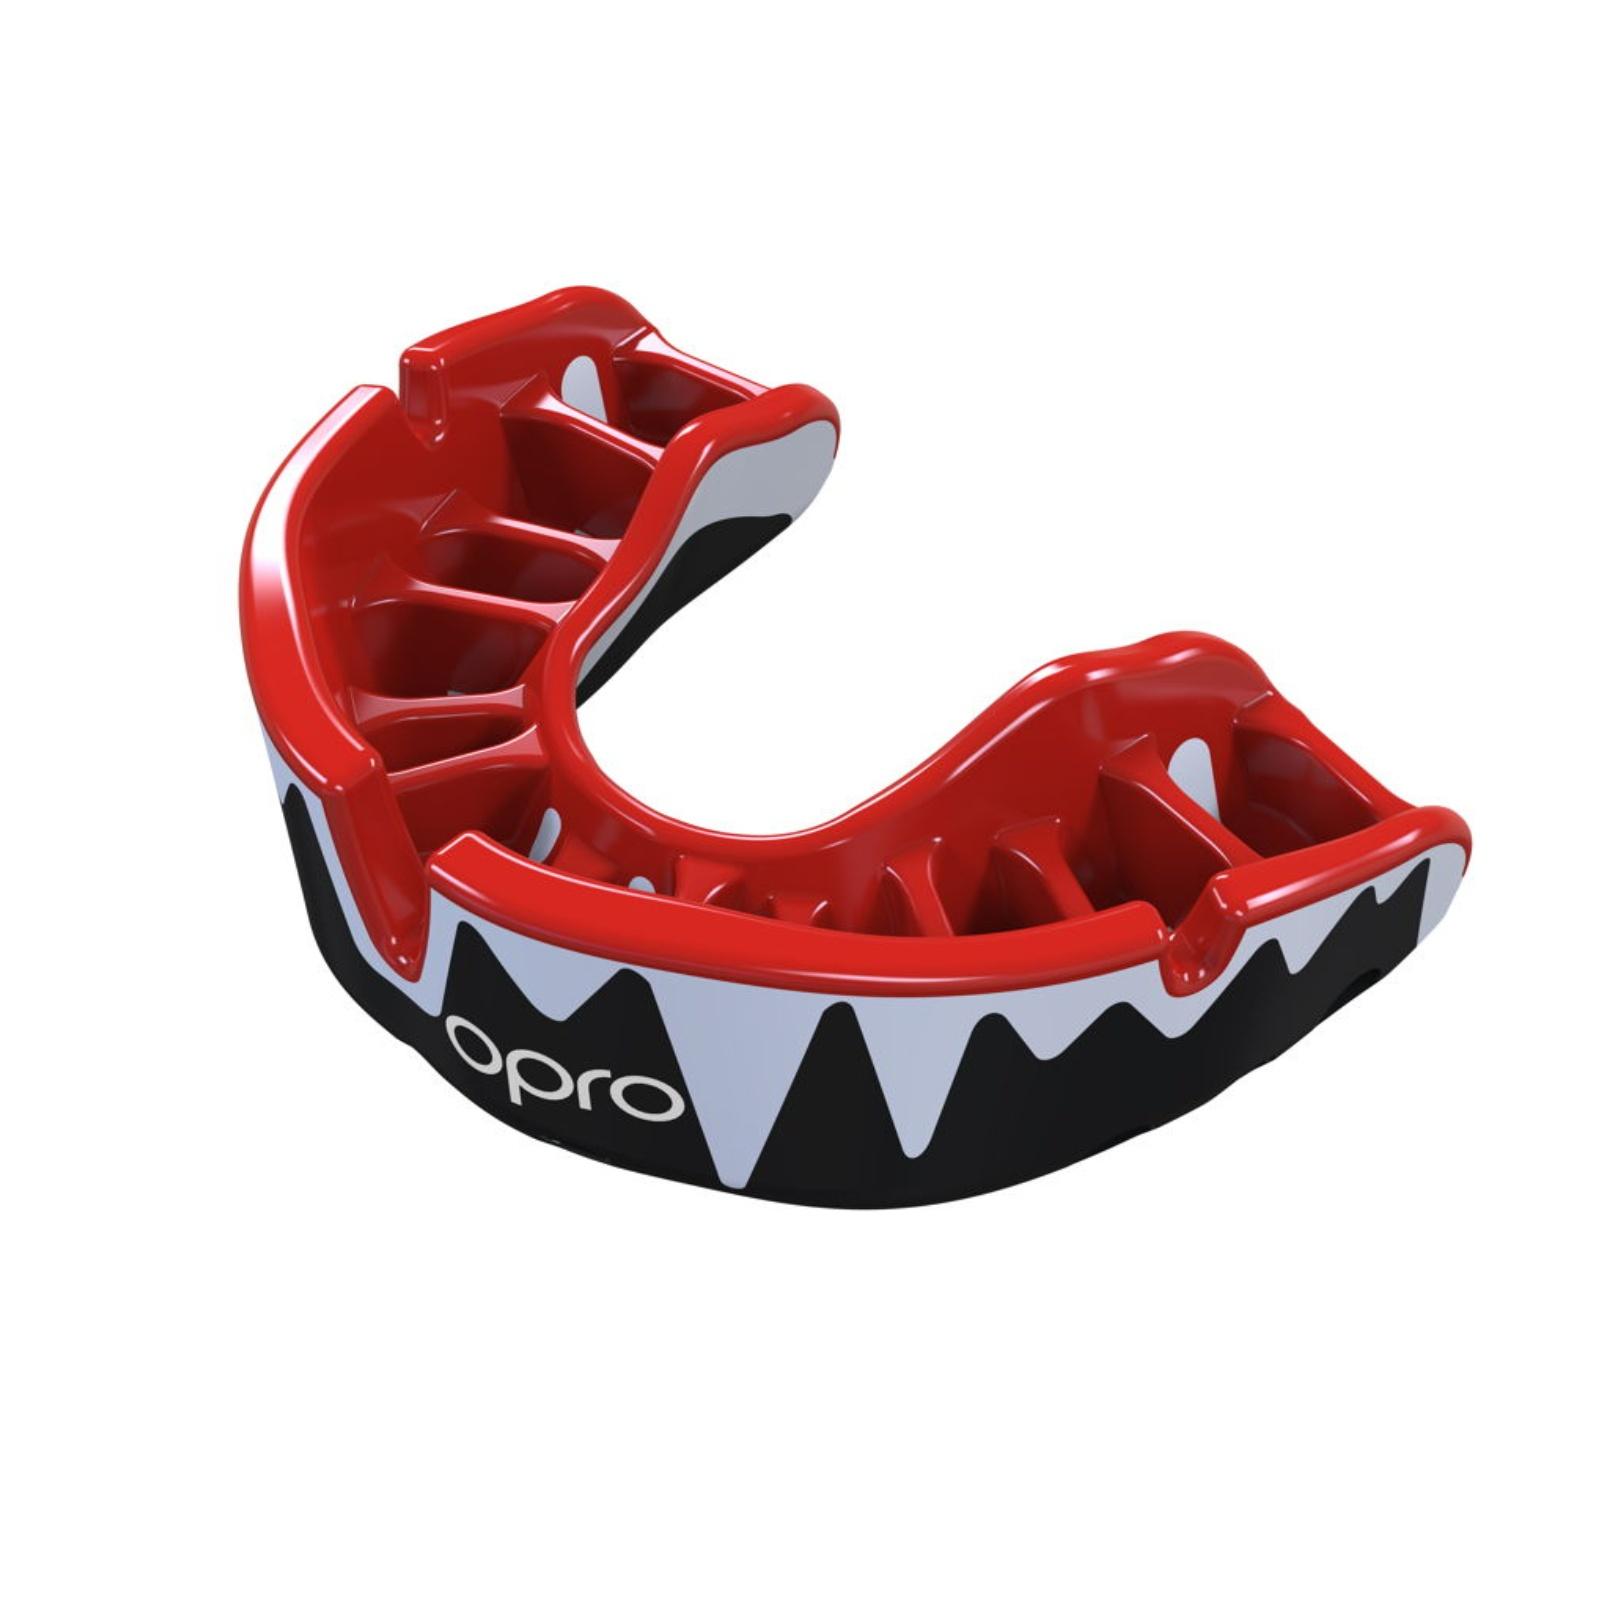 Chránič zubov OPRO Platinum senior